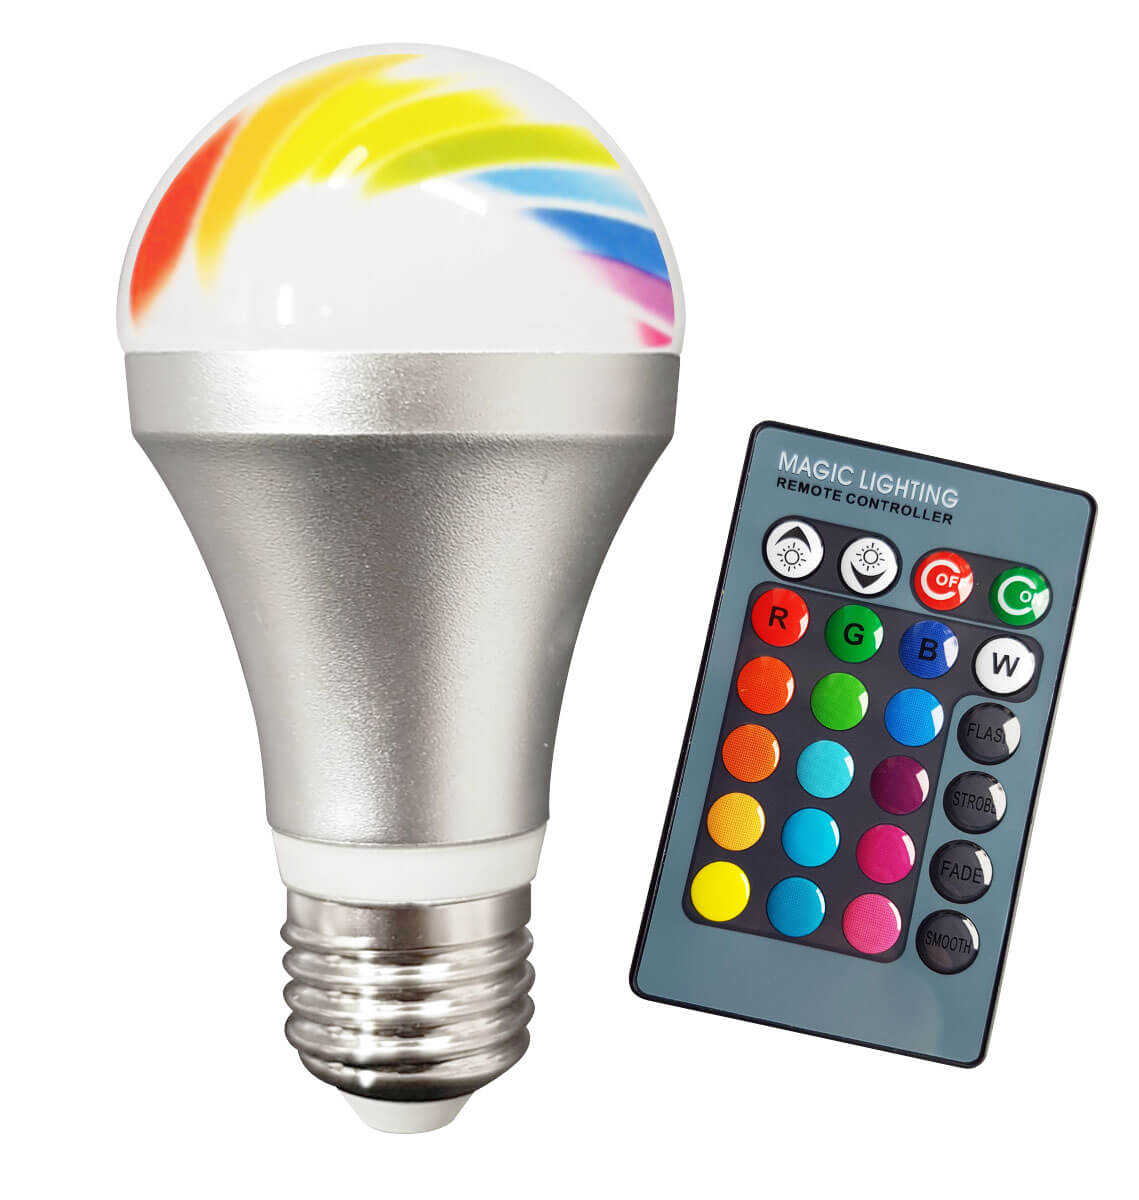 Toppen E27 LED RGB Lampa - Fjärrkontroll FE-66